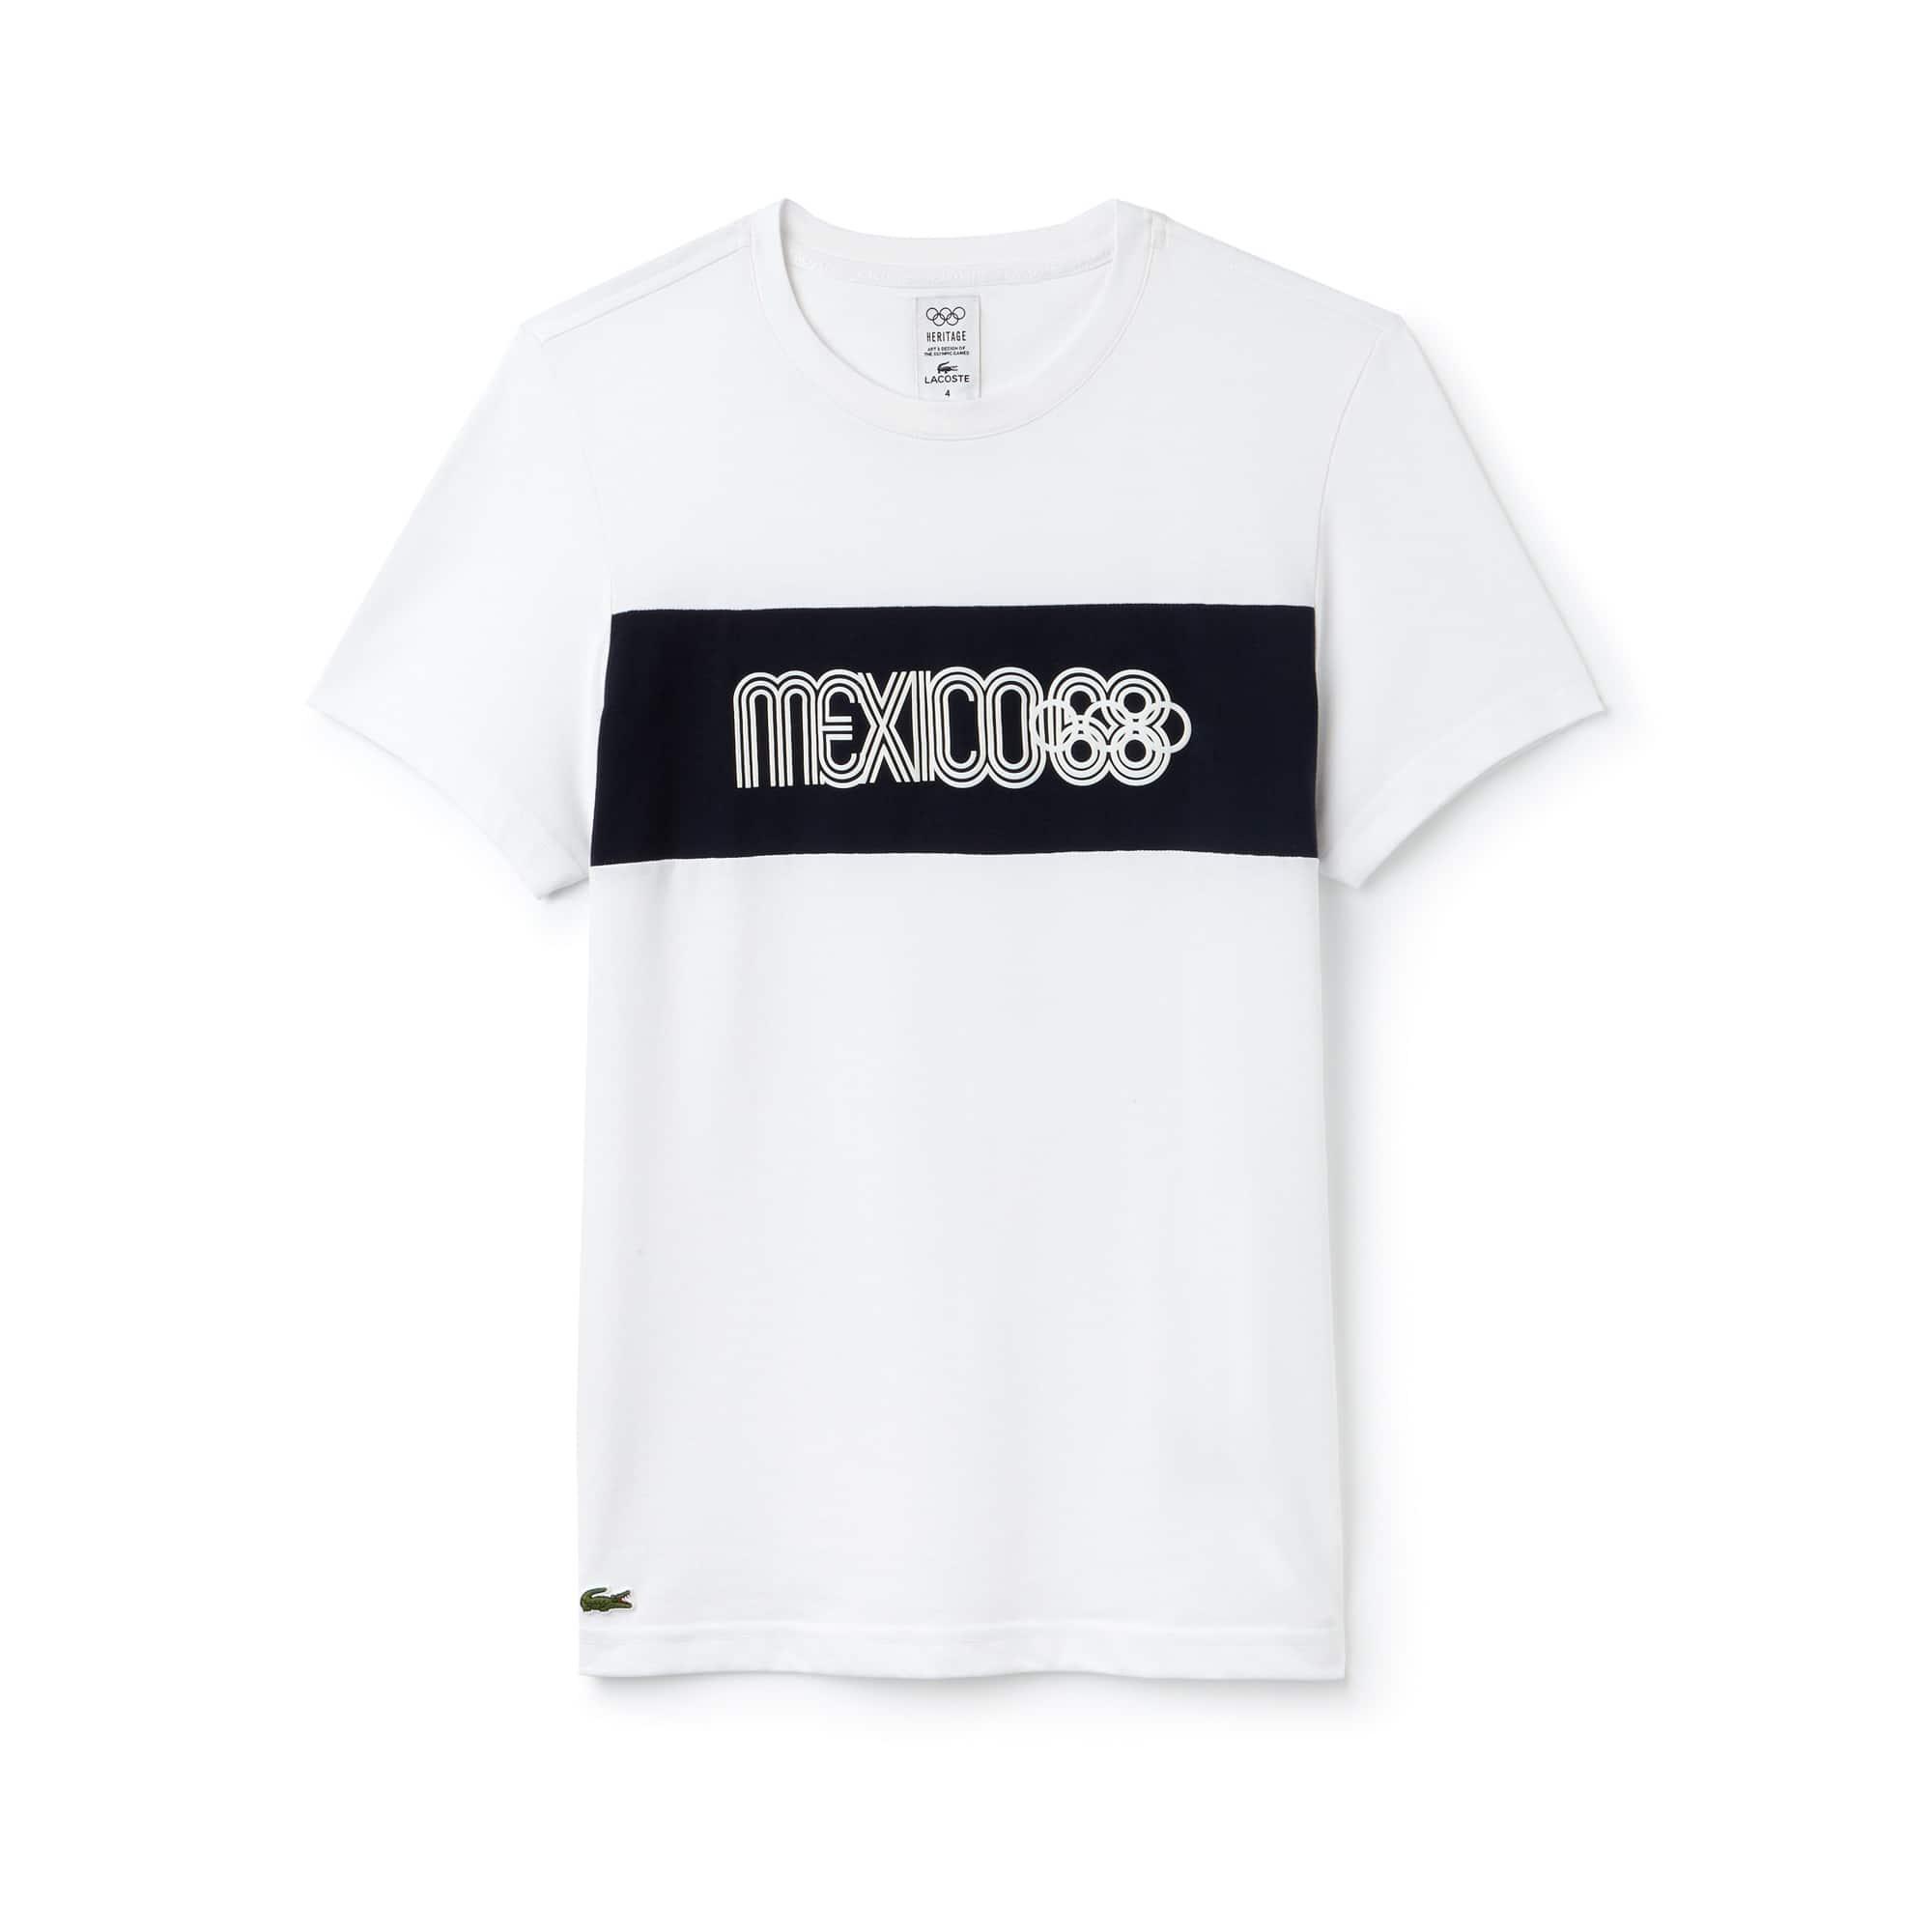 Lacoste SPORT男士奥林匹克传统系列科技棉T恤